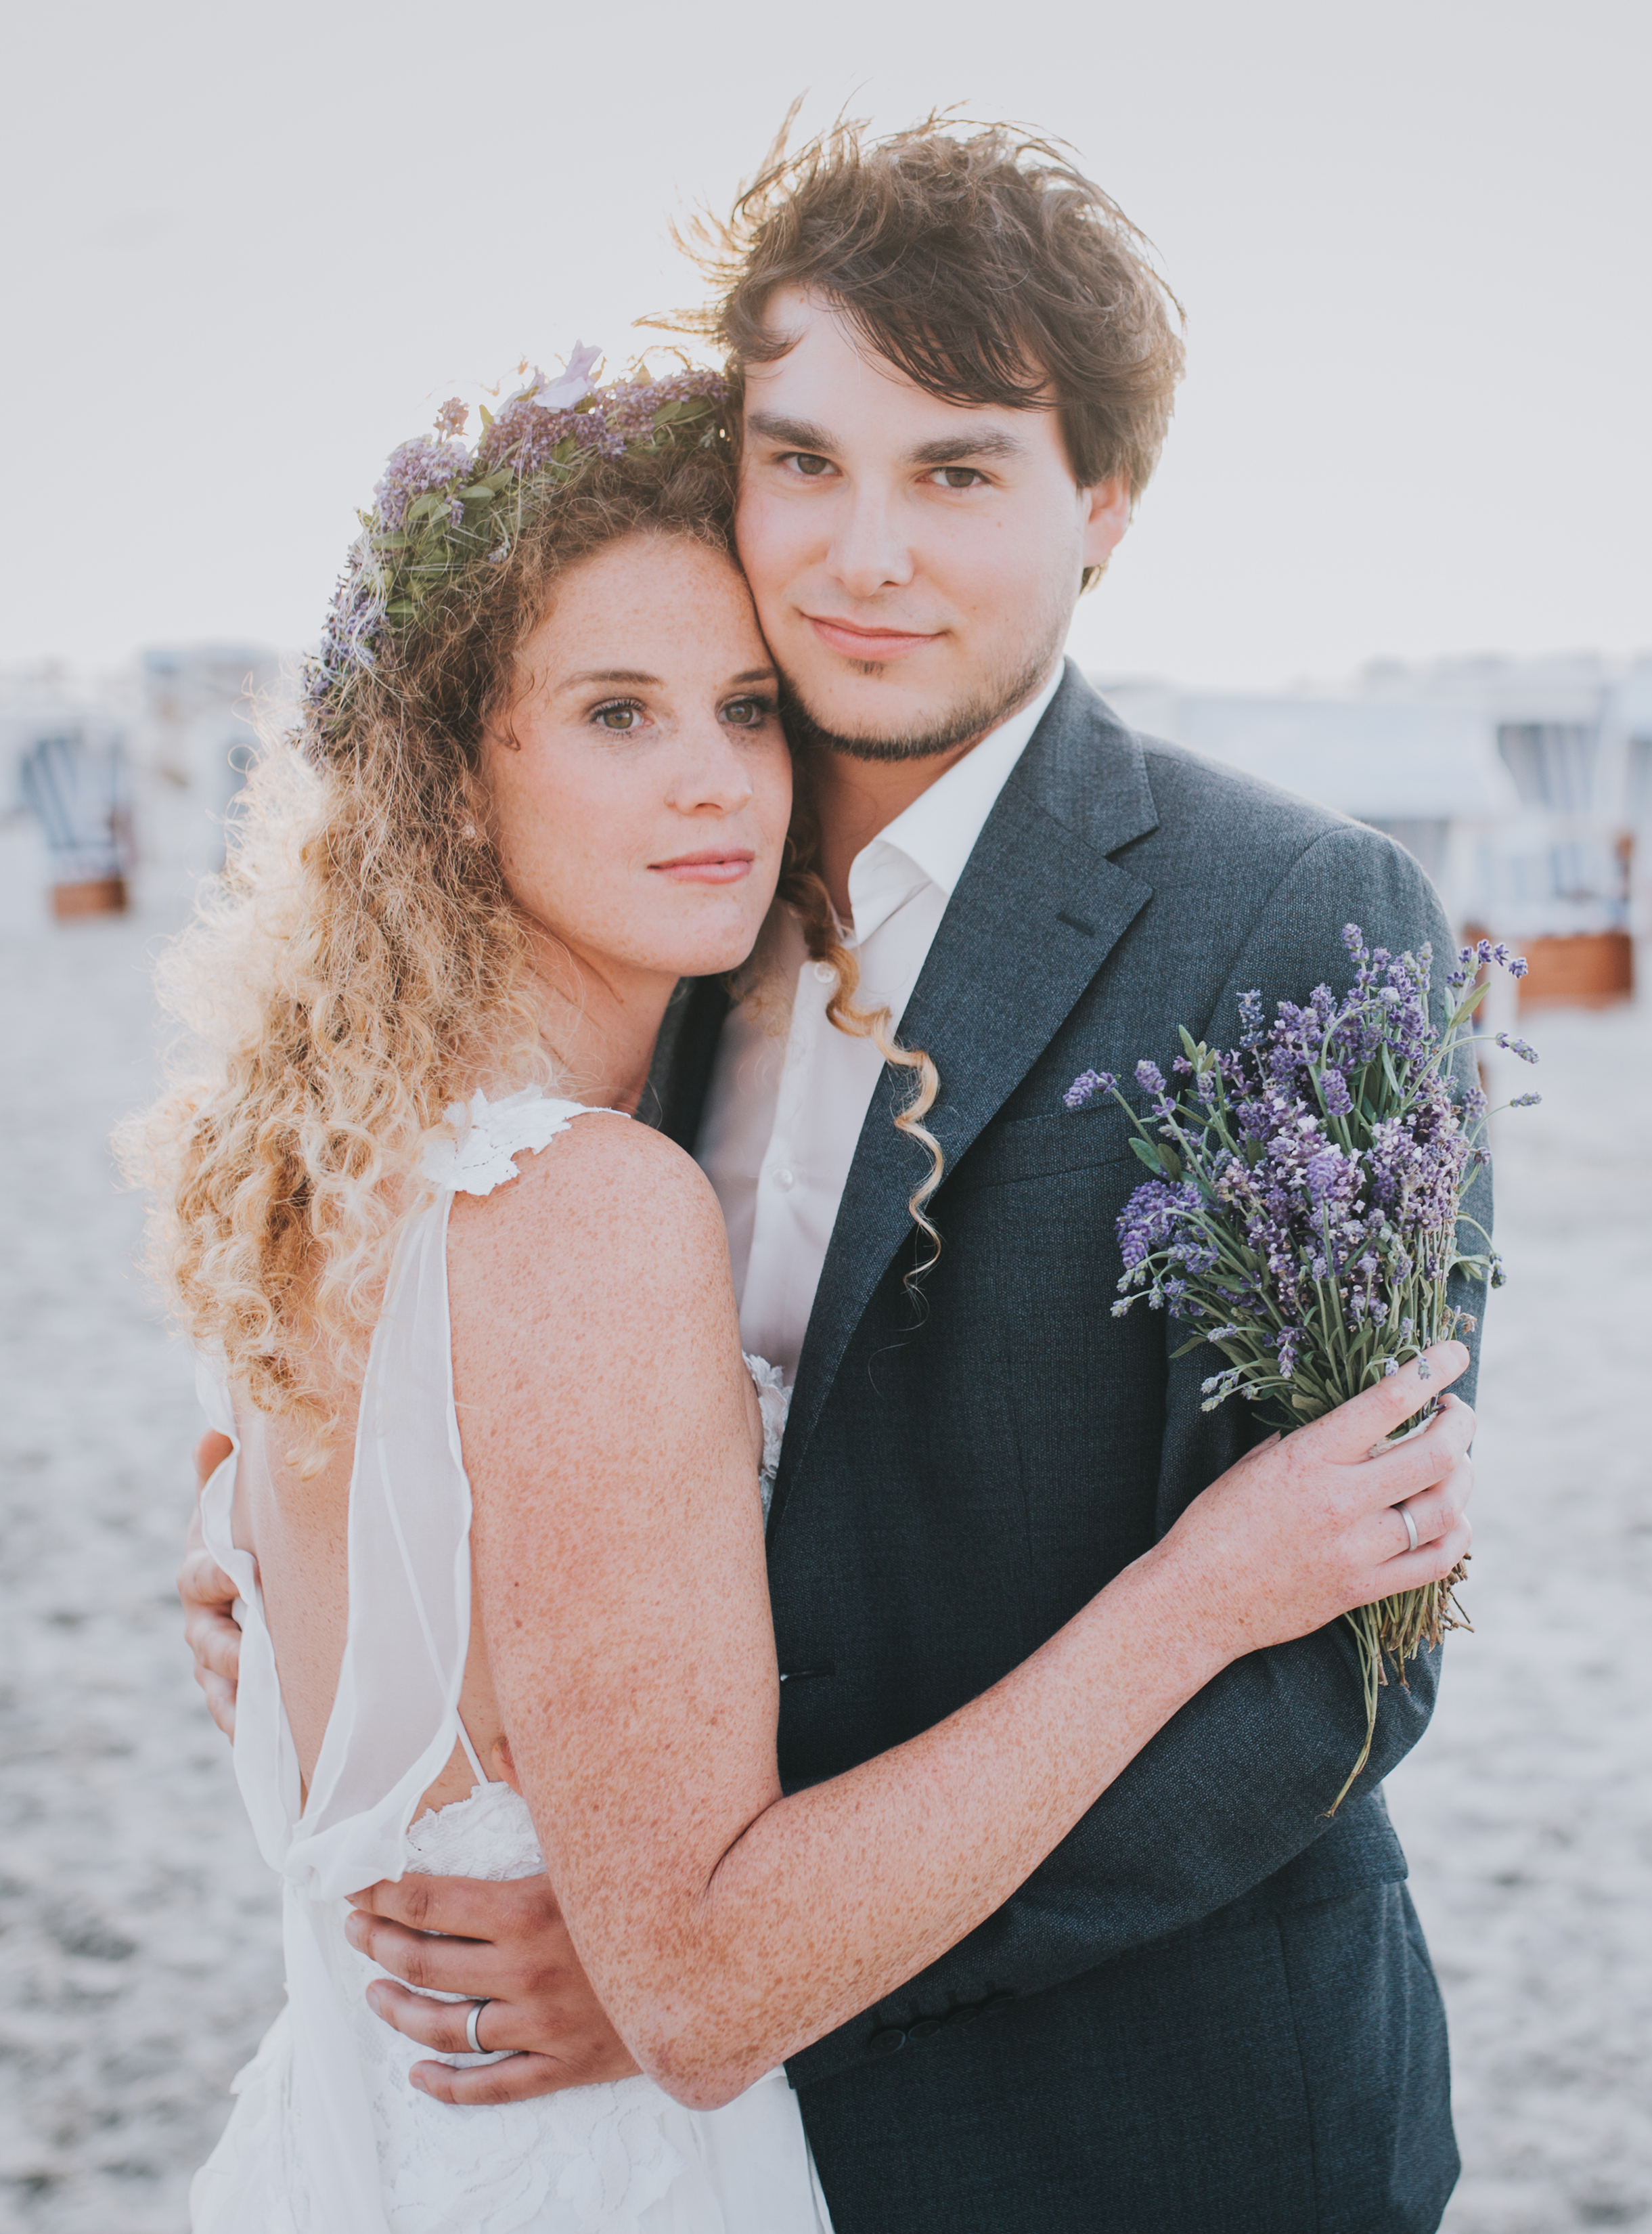 Hochzeitsfotograf - Sankt Peter Ording